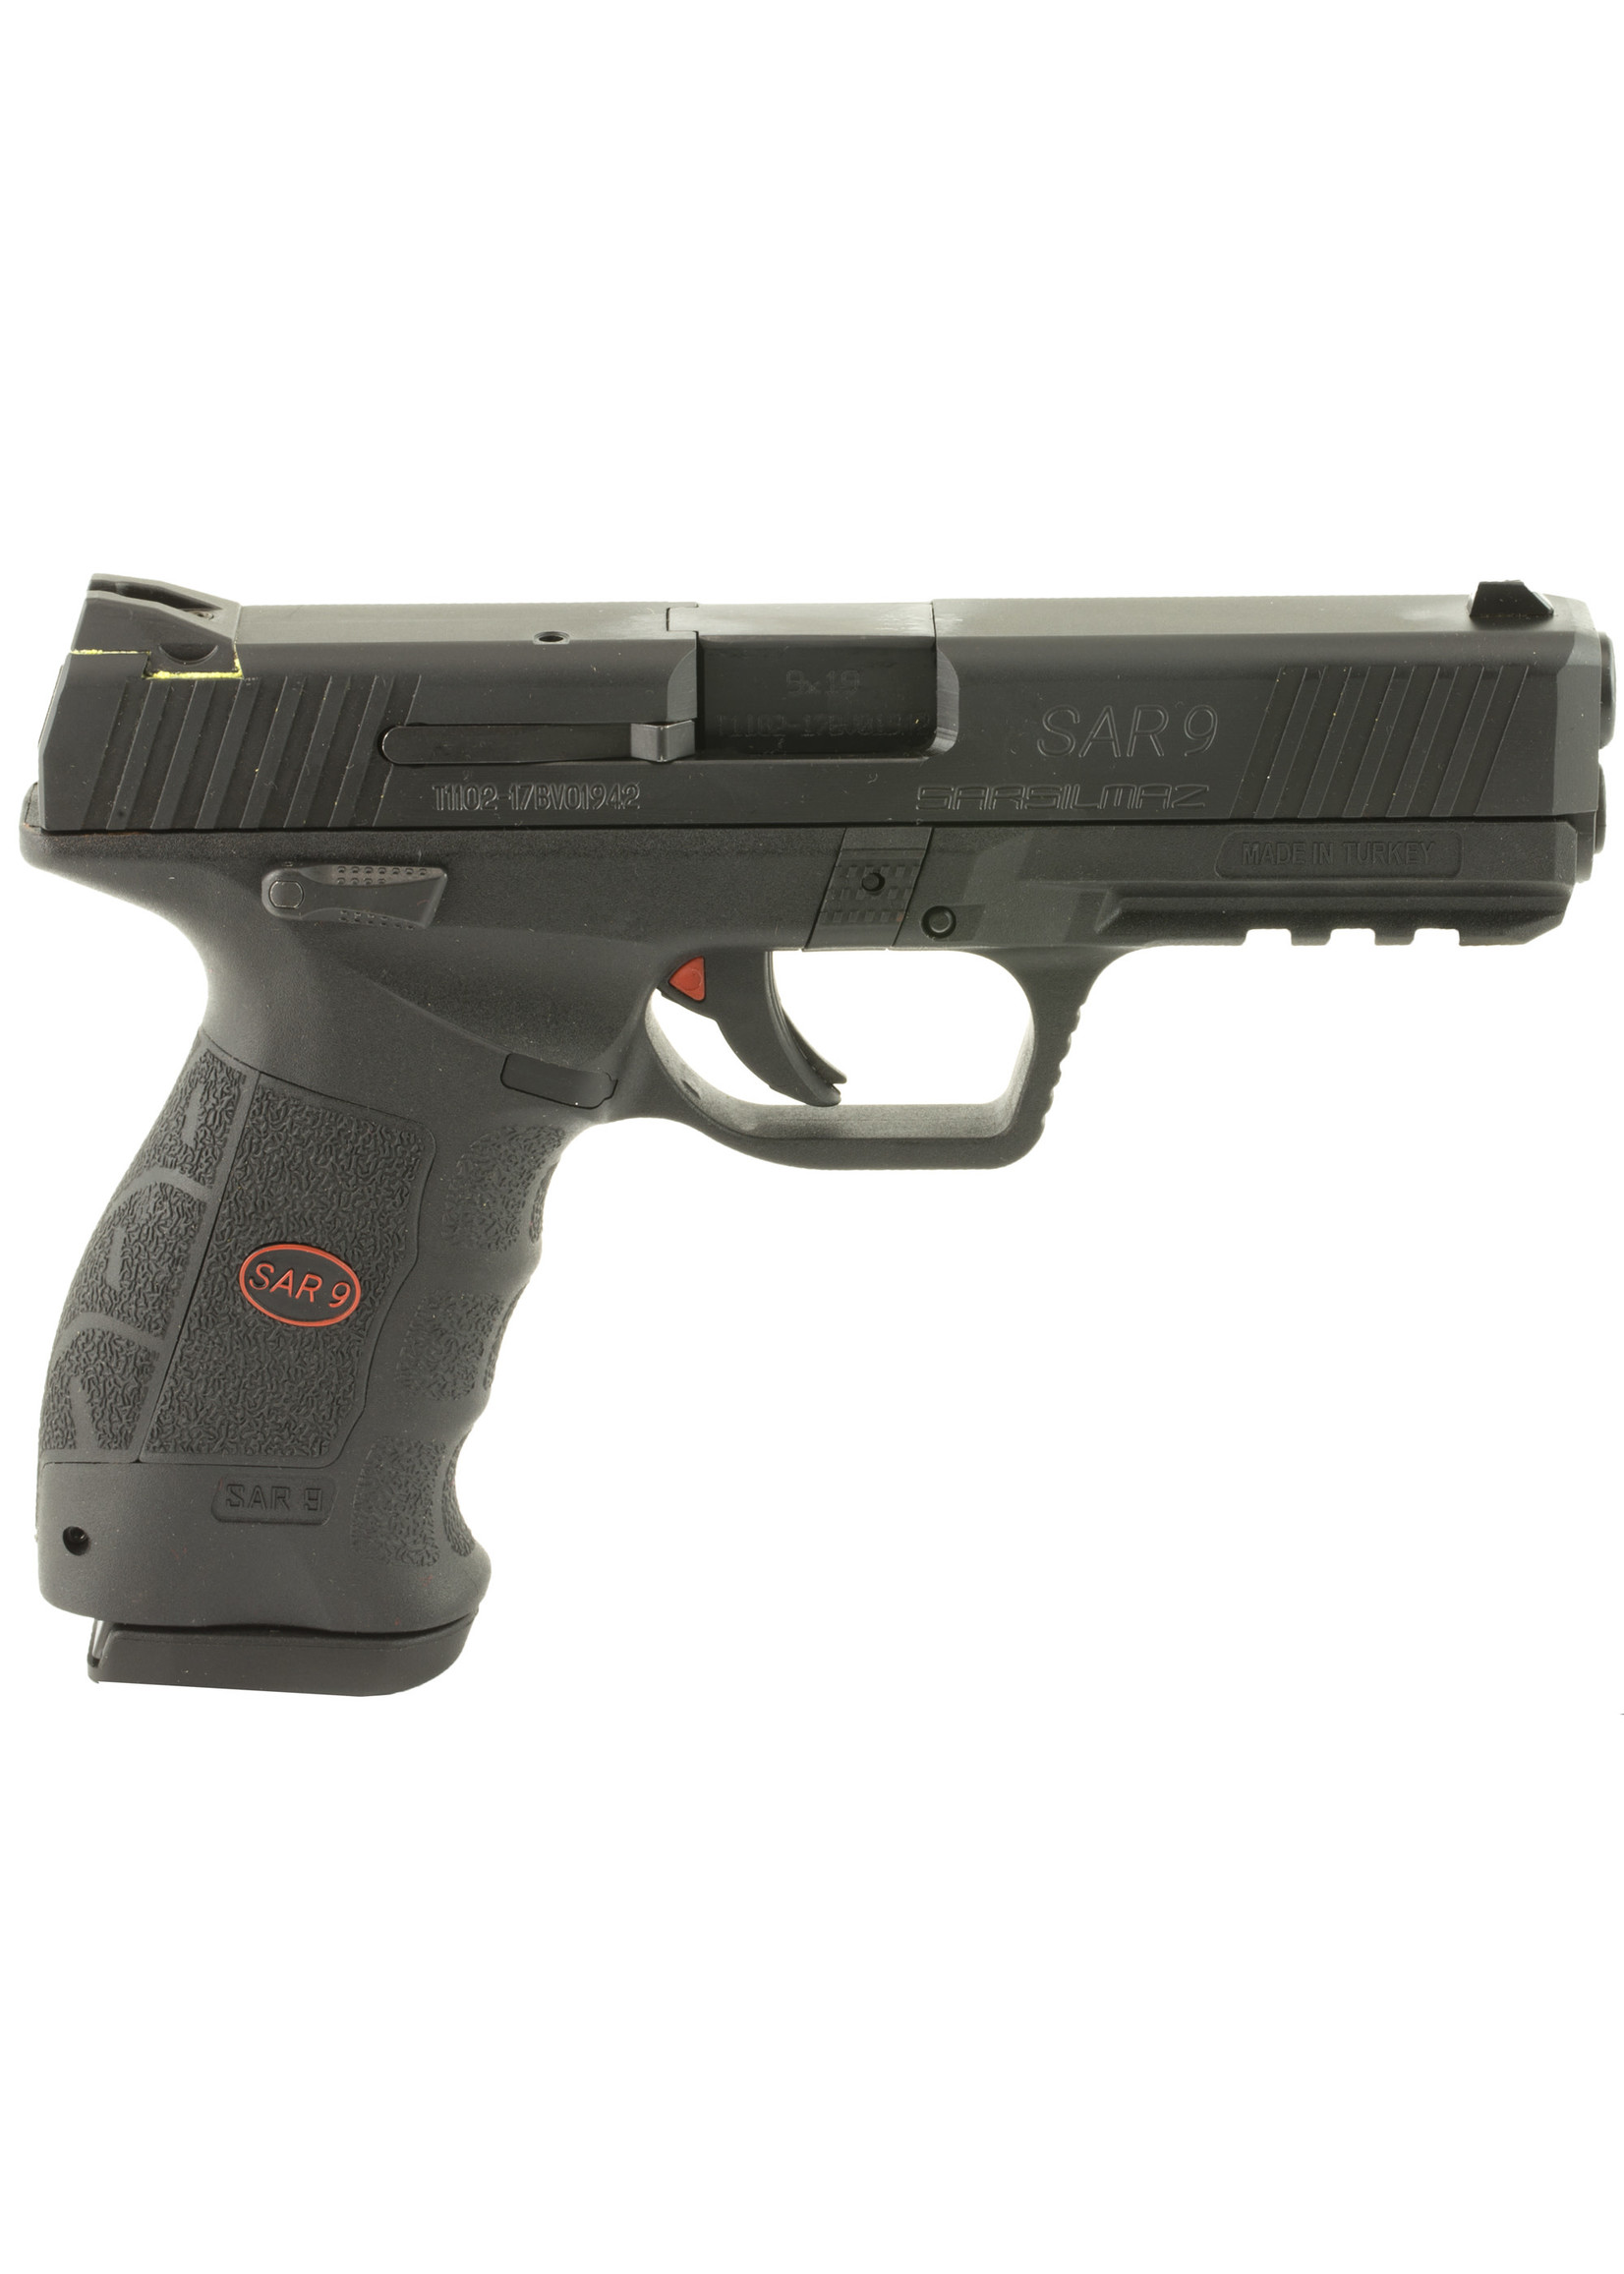 "SAR SAR USA, SAR9, Semi-automatic, Striker Fired Pistol, 9MM, 4.4"" Barrel, Polymer Frame, Black Finish, 17Rd, 2 Magazines"